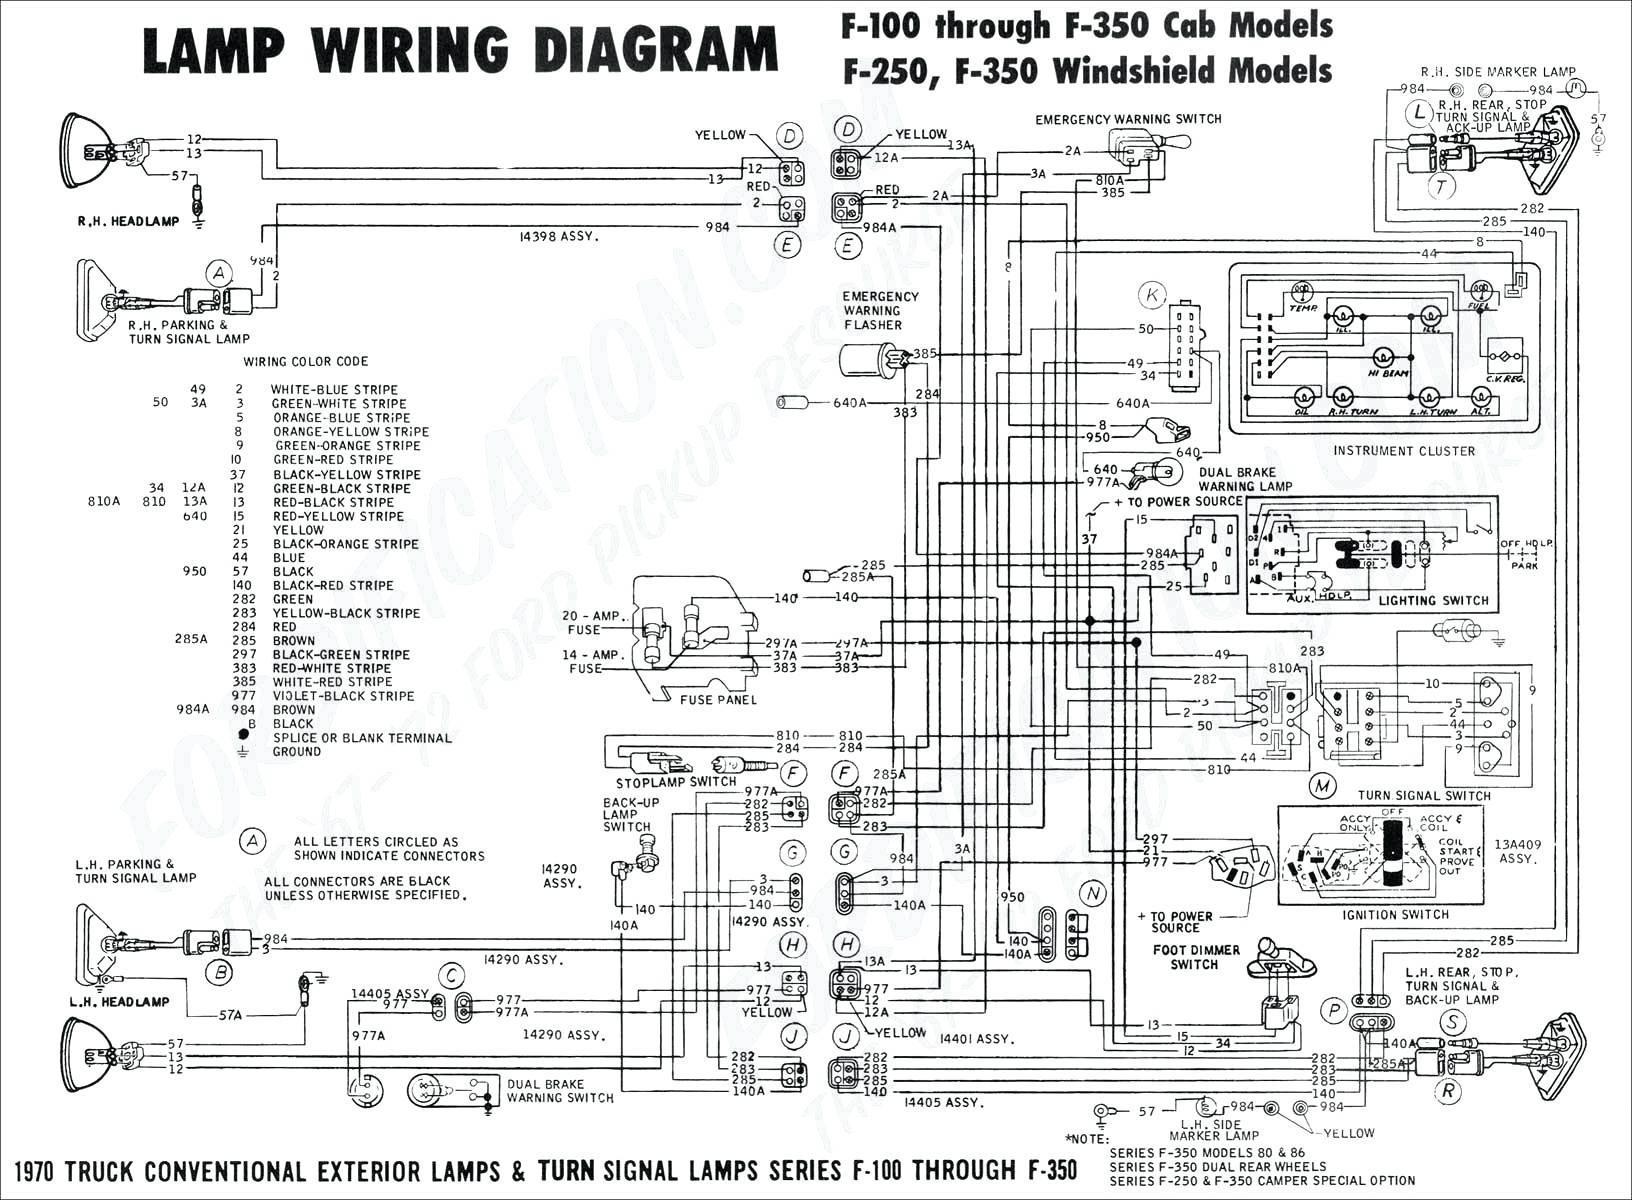 Speaker Wiring Diagram Trailblazer Aw 5583] 98 Expedition Radio Wire Diagram Of Speaker Wiring Diagram Trailblazer